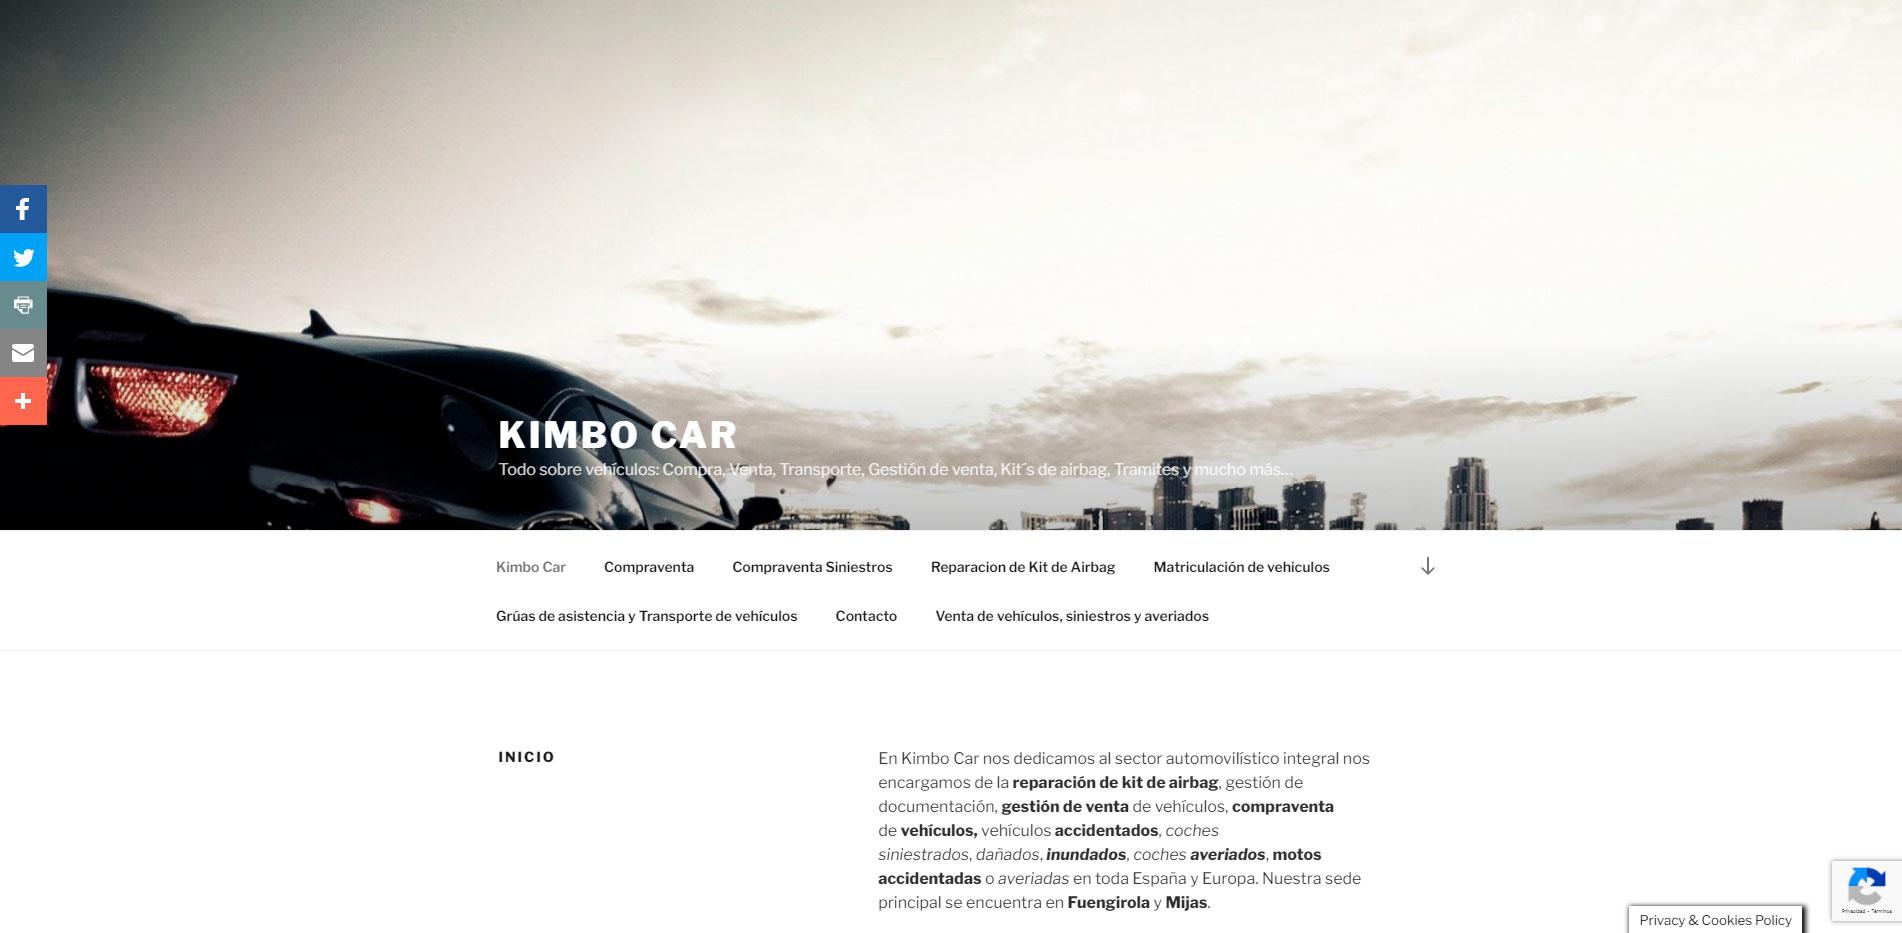 Captura-de-pantalla-Kimbocar-1